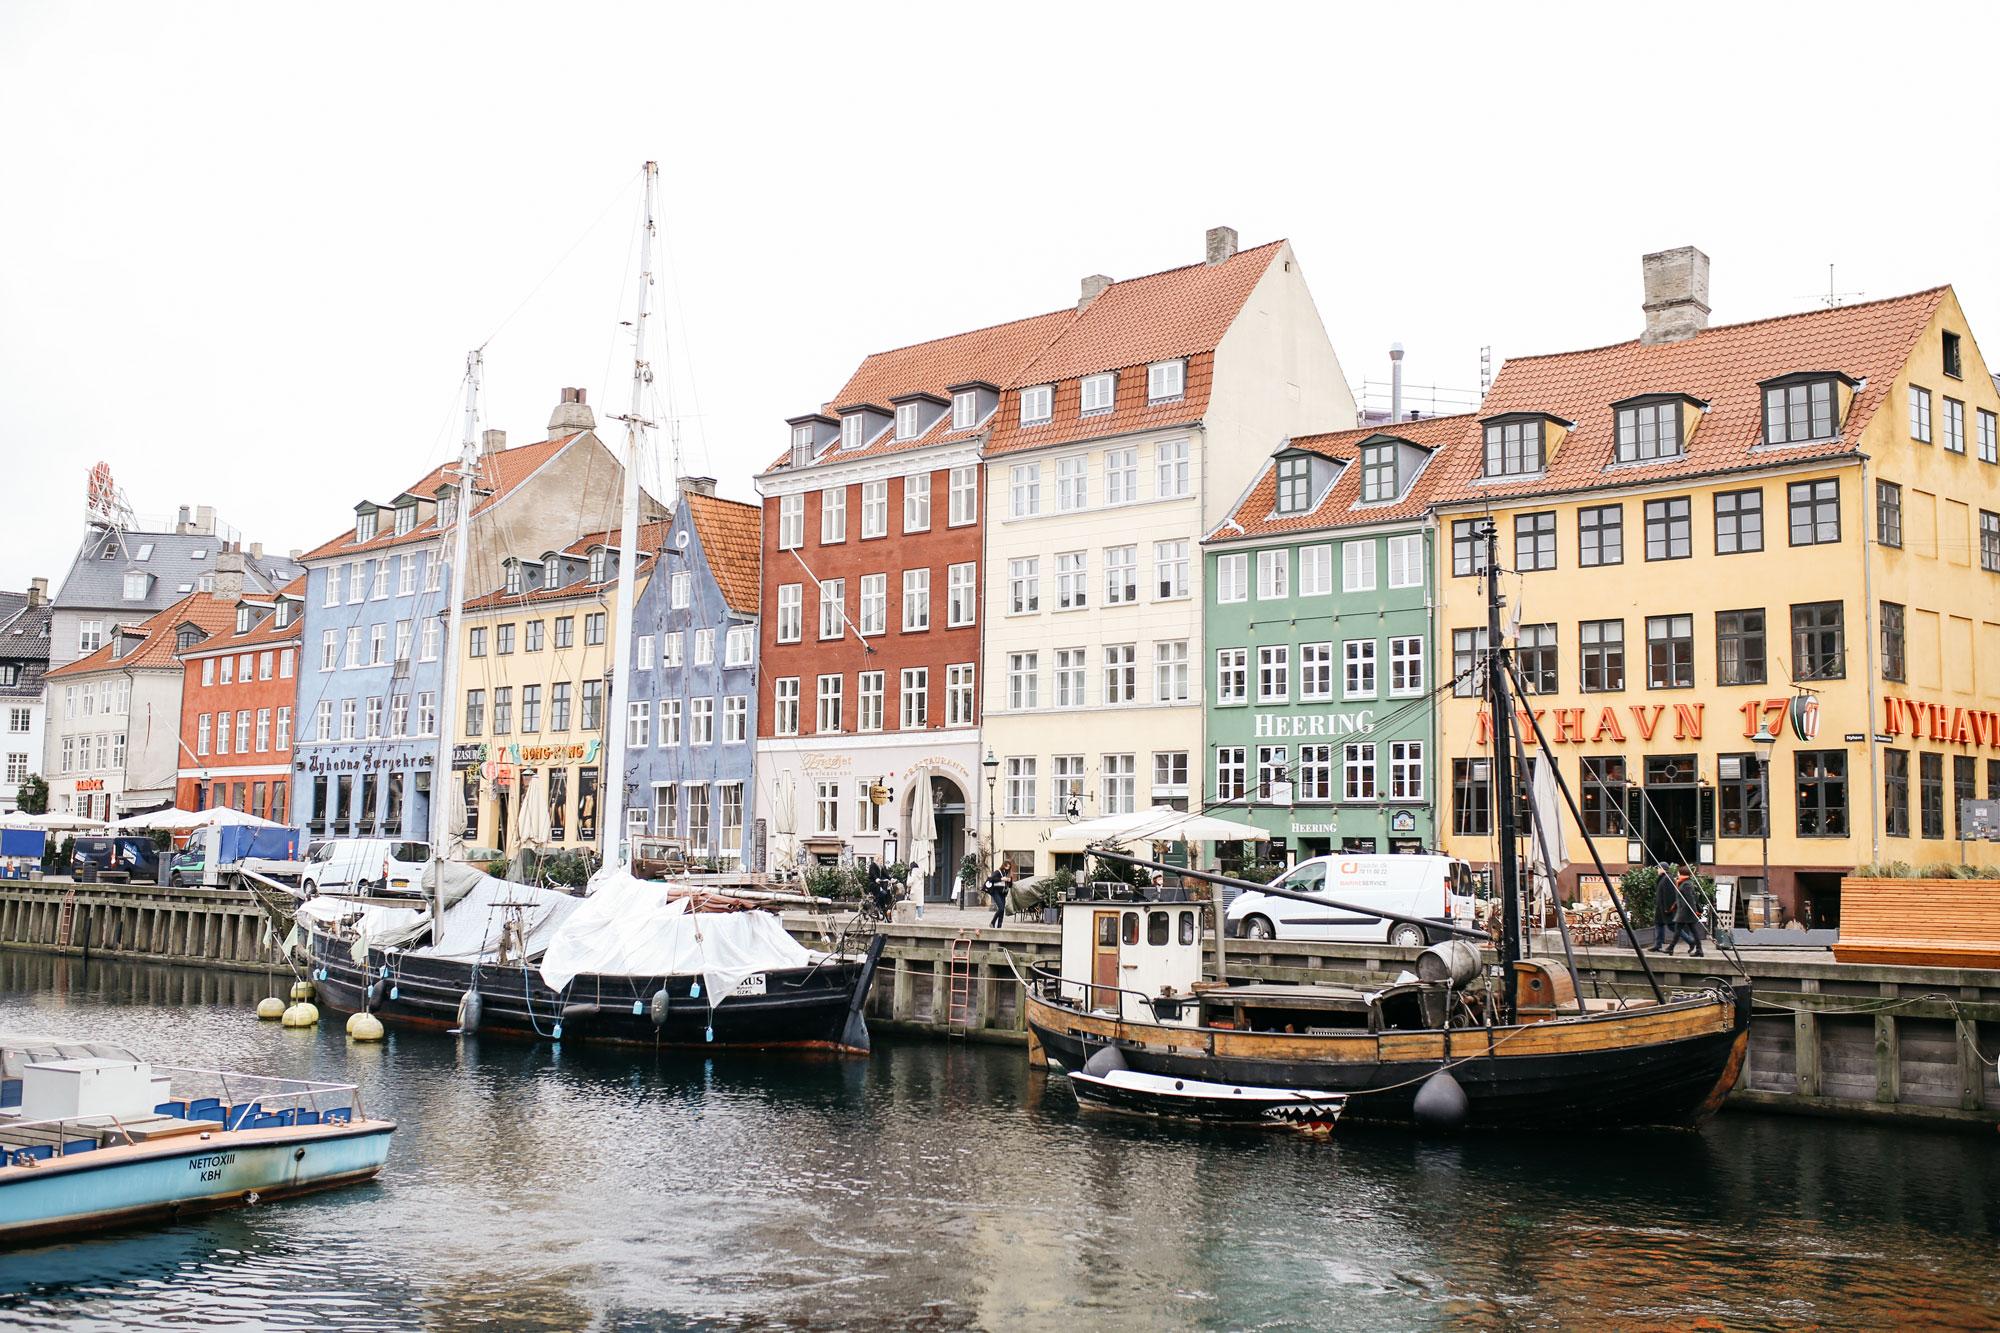 port Nyhavn, Copenhagen | style: colorful, sophisticated, fun, sporty, office, checked | brands: Baum & Pferdgarten, Dr. Martens | fashion editorial blogger